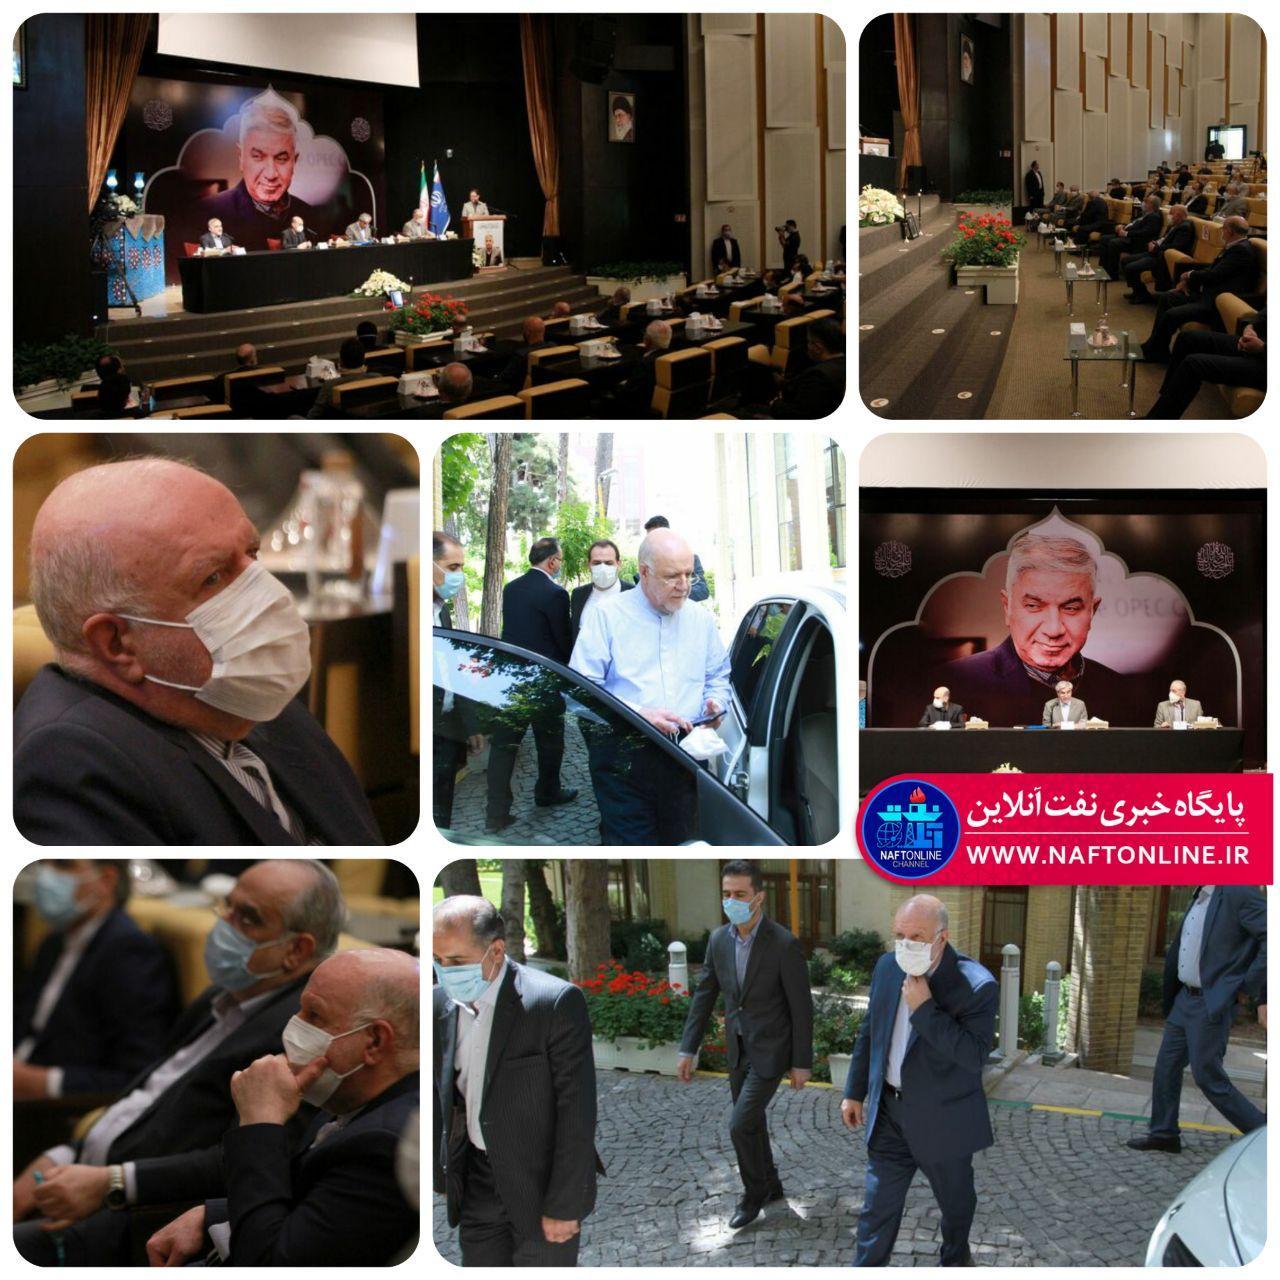 نفت آنلاین | مراسم مرحوم کاظمی پور